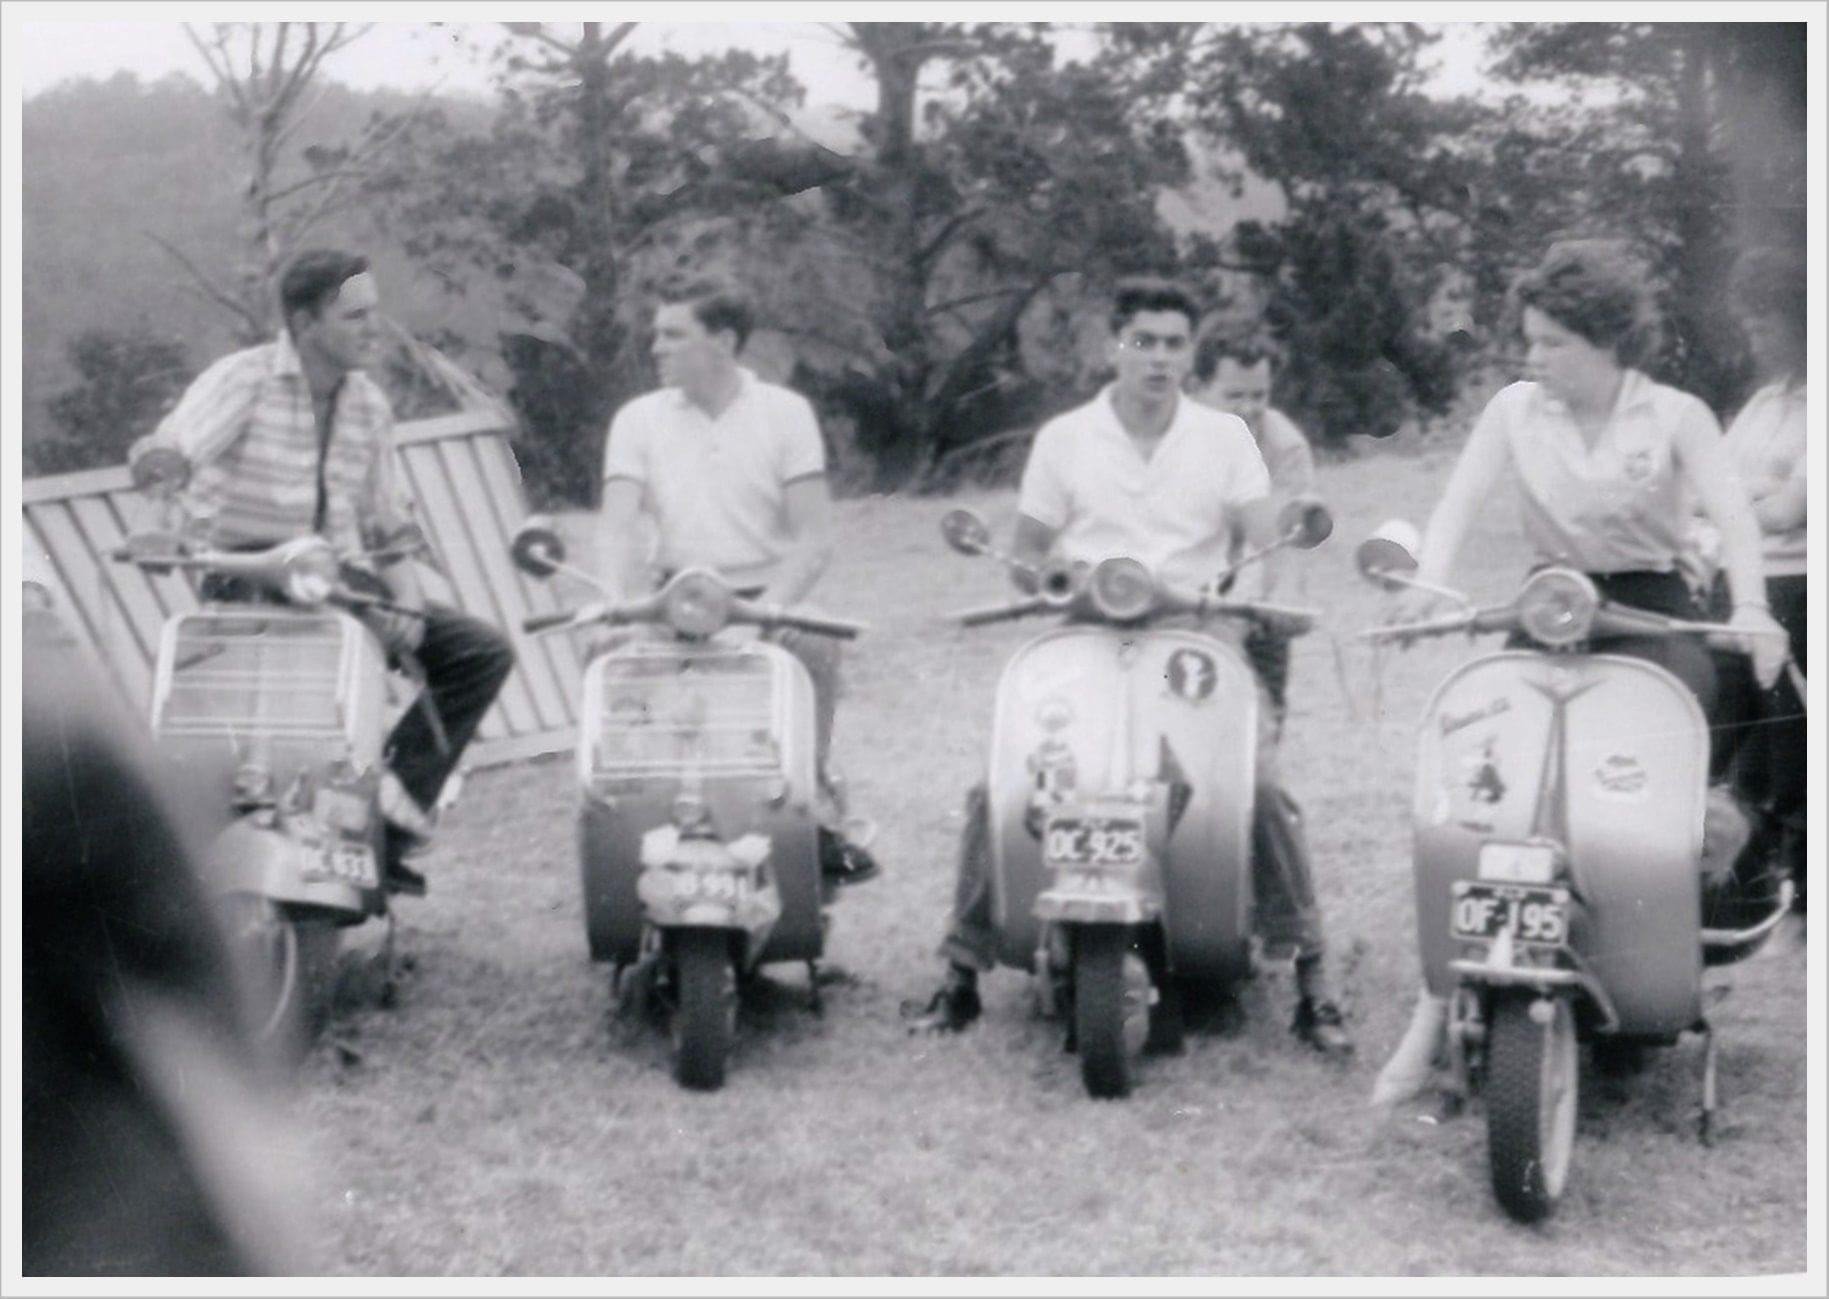 Vespa club members, Toowoomba 1960